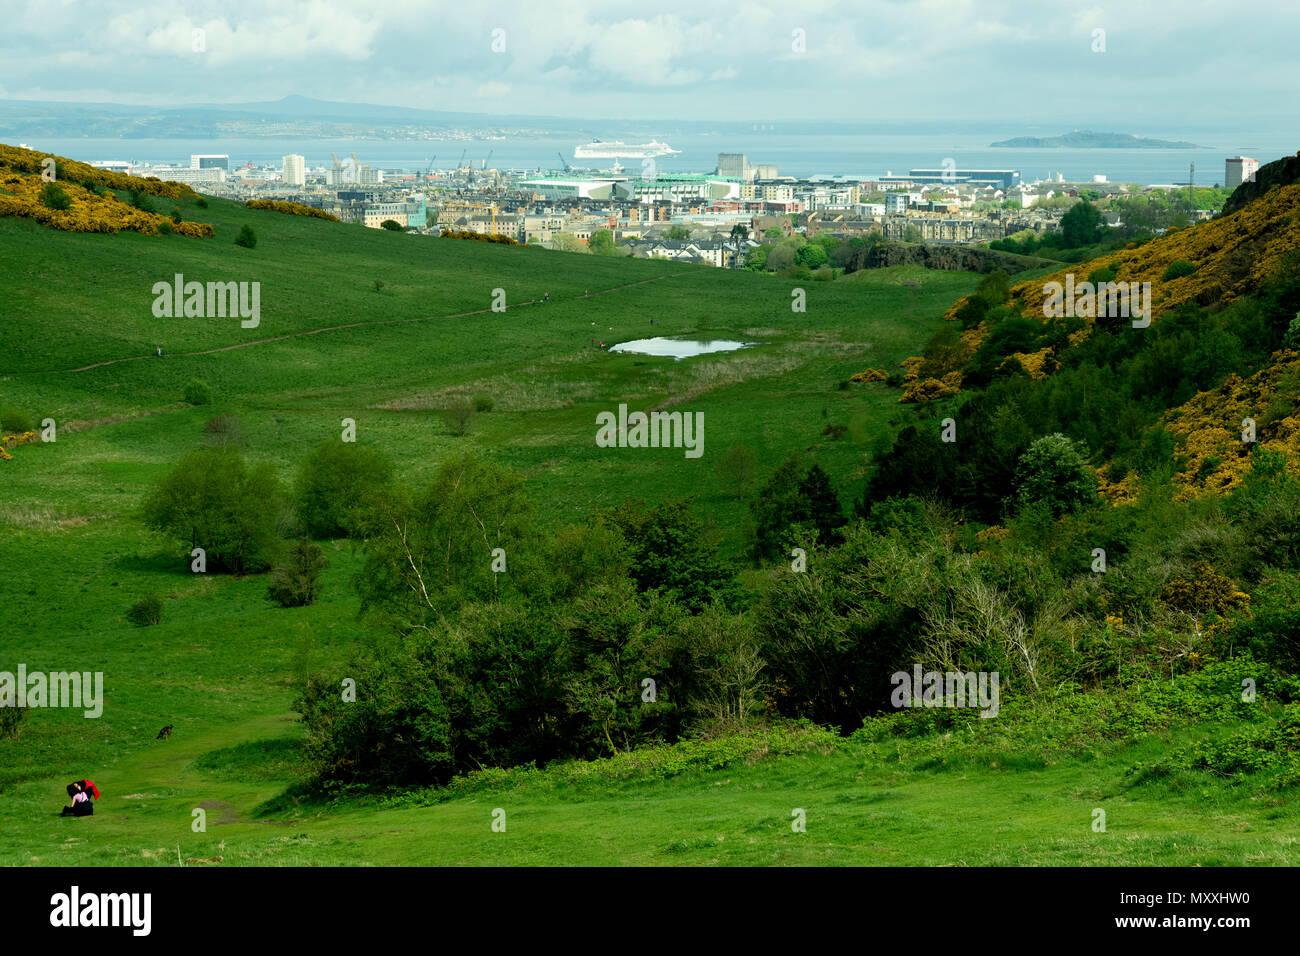 Edinburg view from Holyrood Park, Scotland - Stock Image